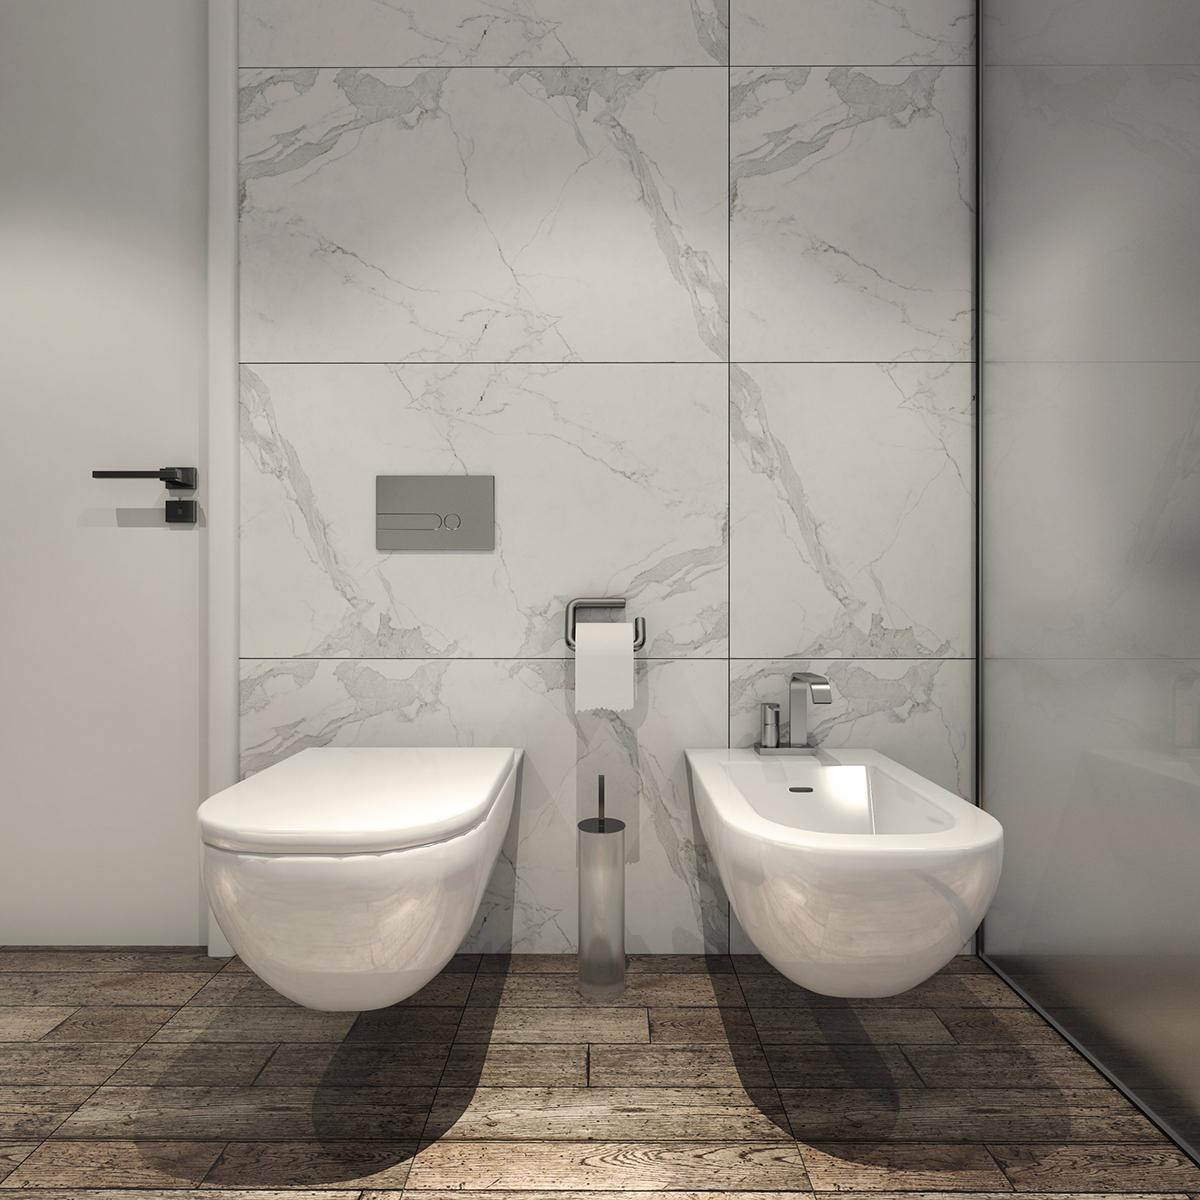 Bathroom Design 3 Vray Training On Behance